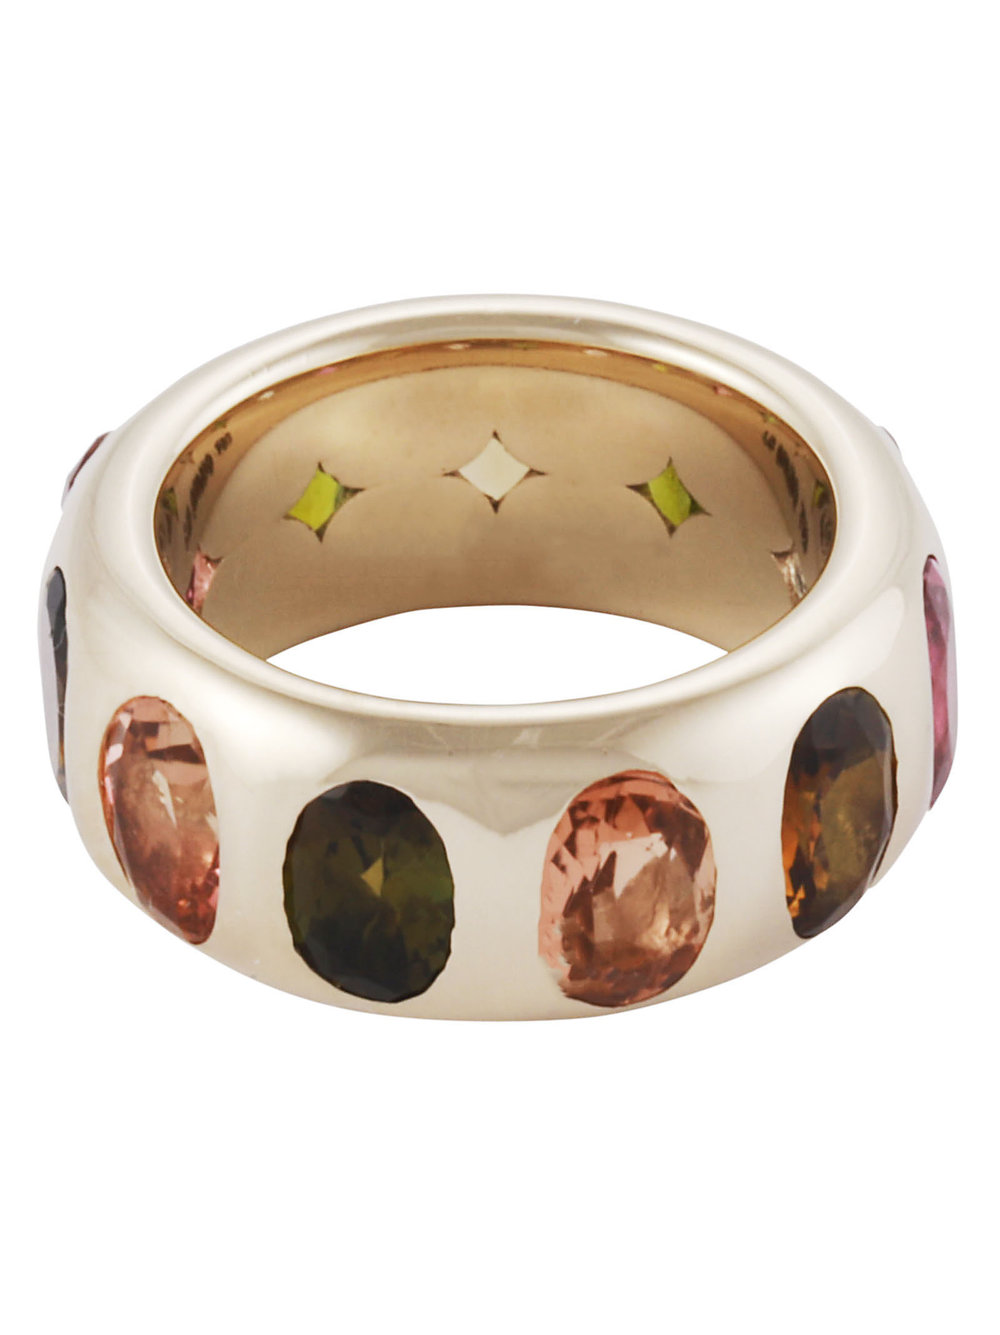 Tourmaline Eclipse Ring